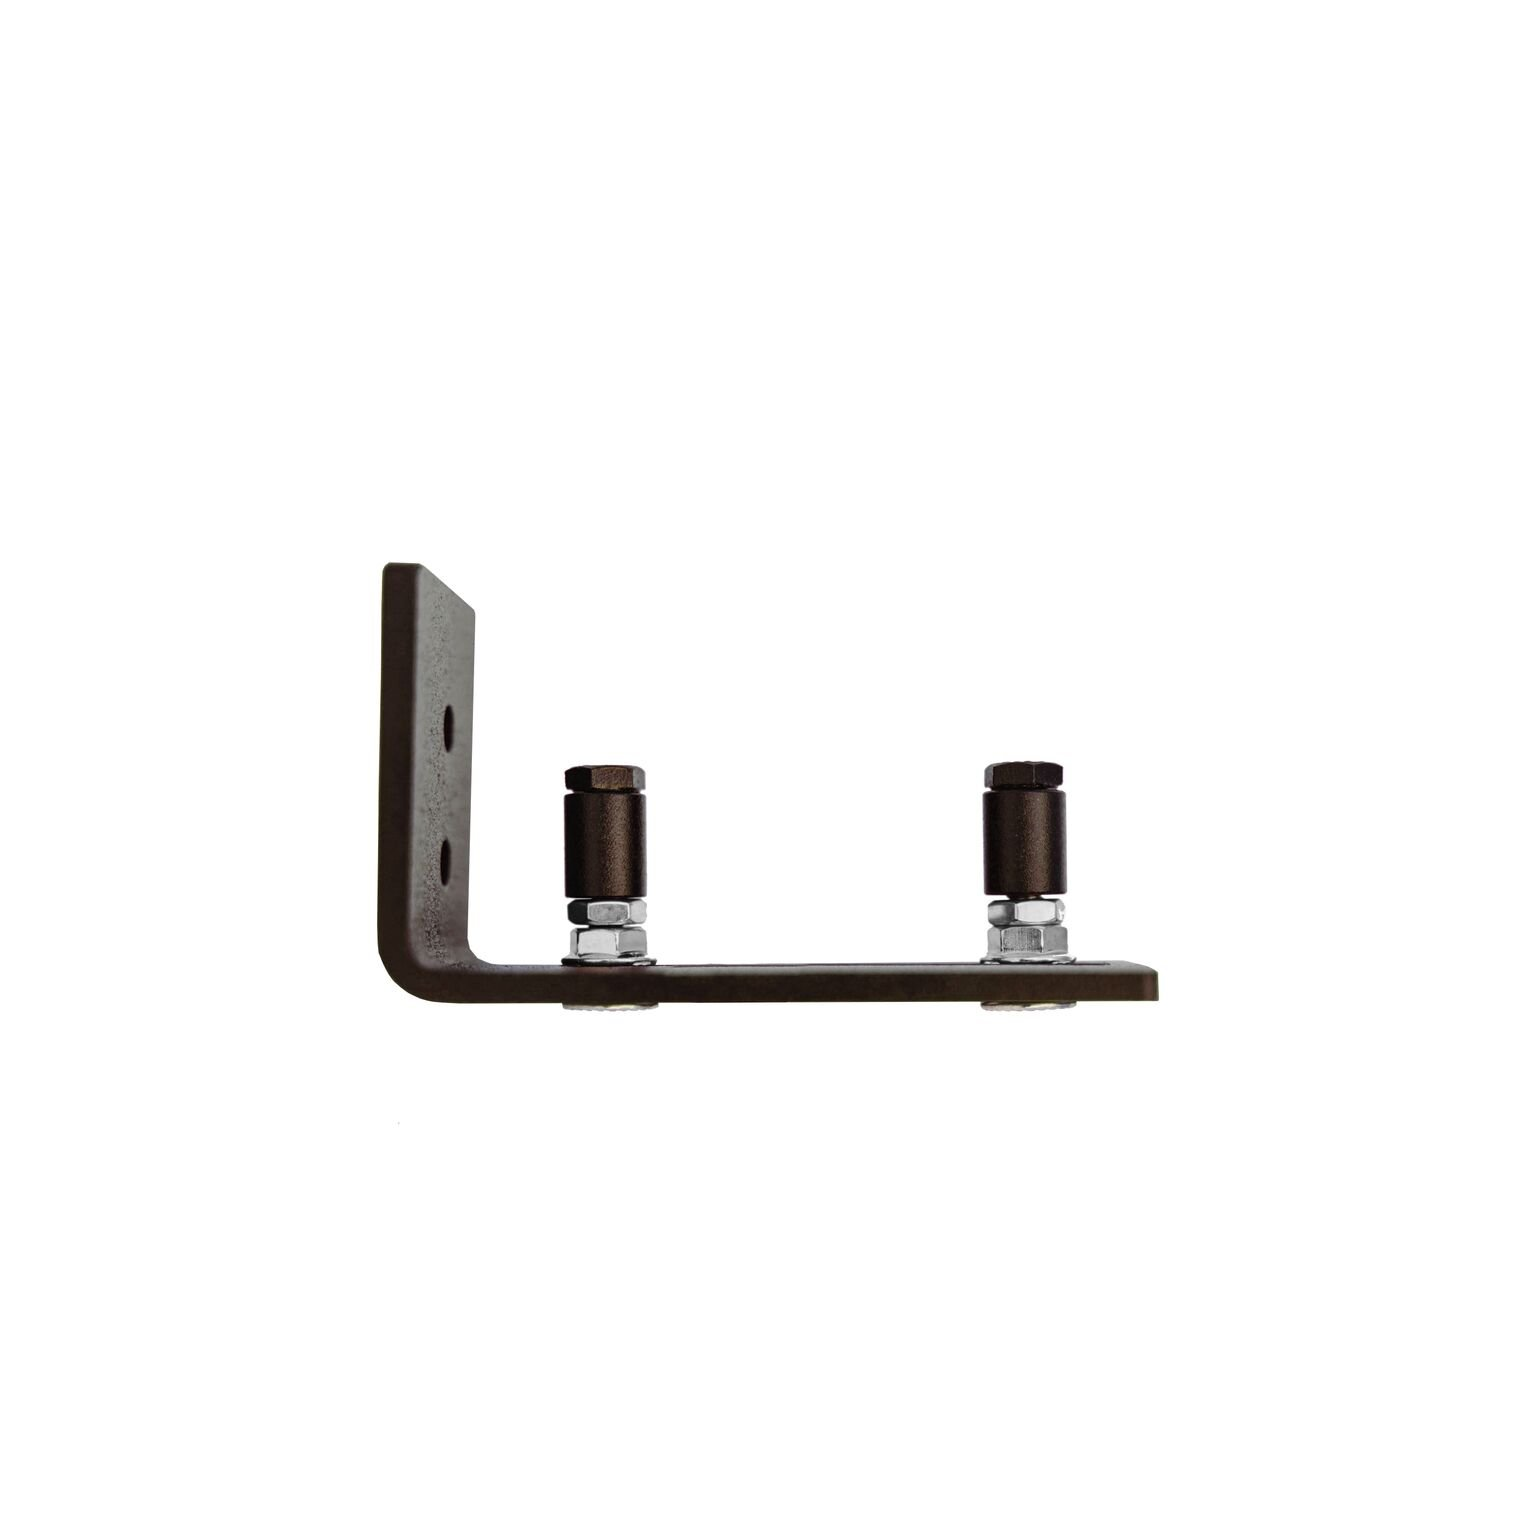 Adjustable Channel Wall Mount Floor Guide Roller for Barn Door Hardware, Powder Coated Oil Rubbed Bronze